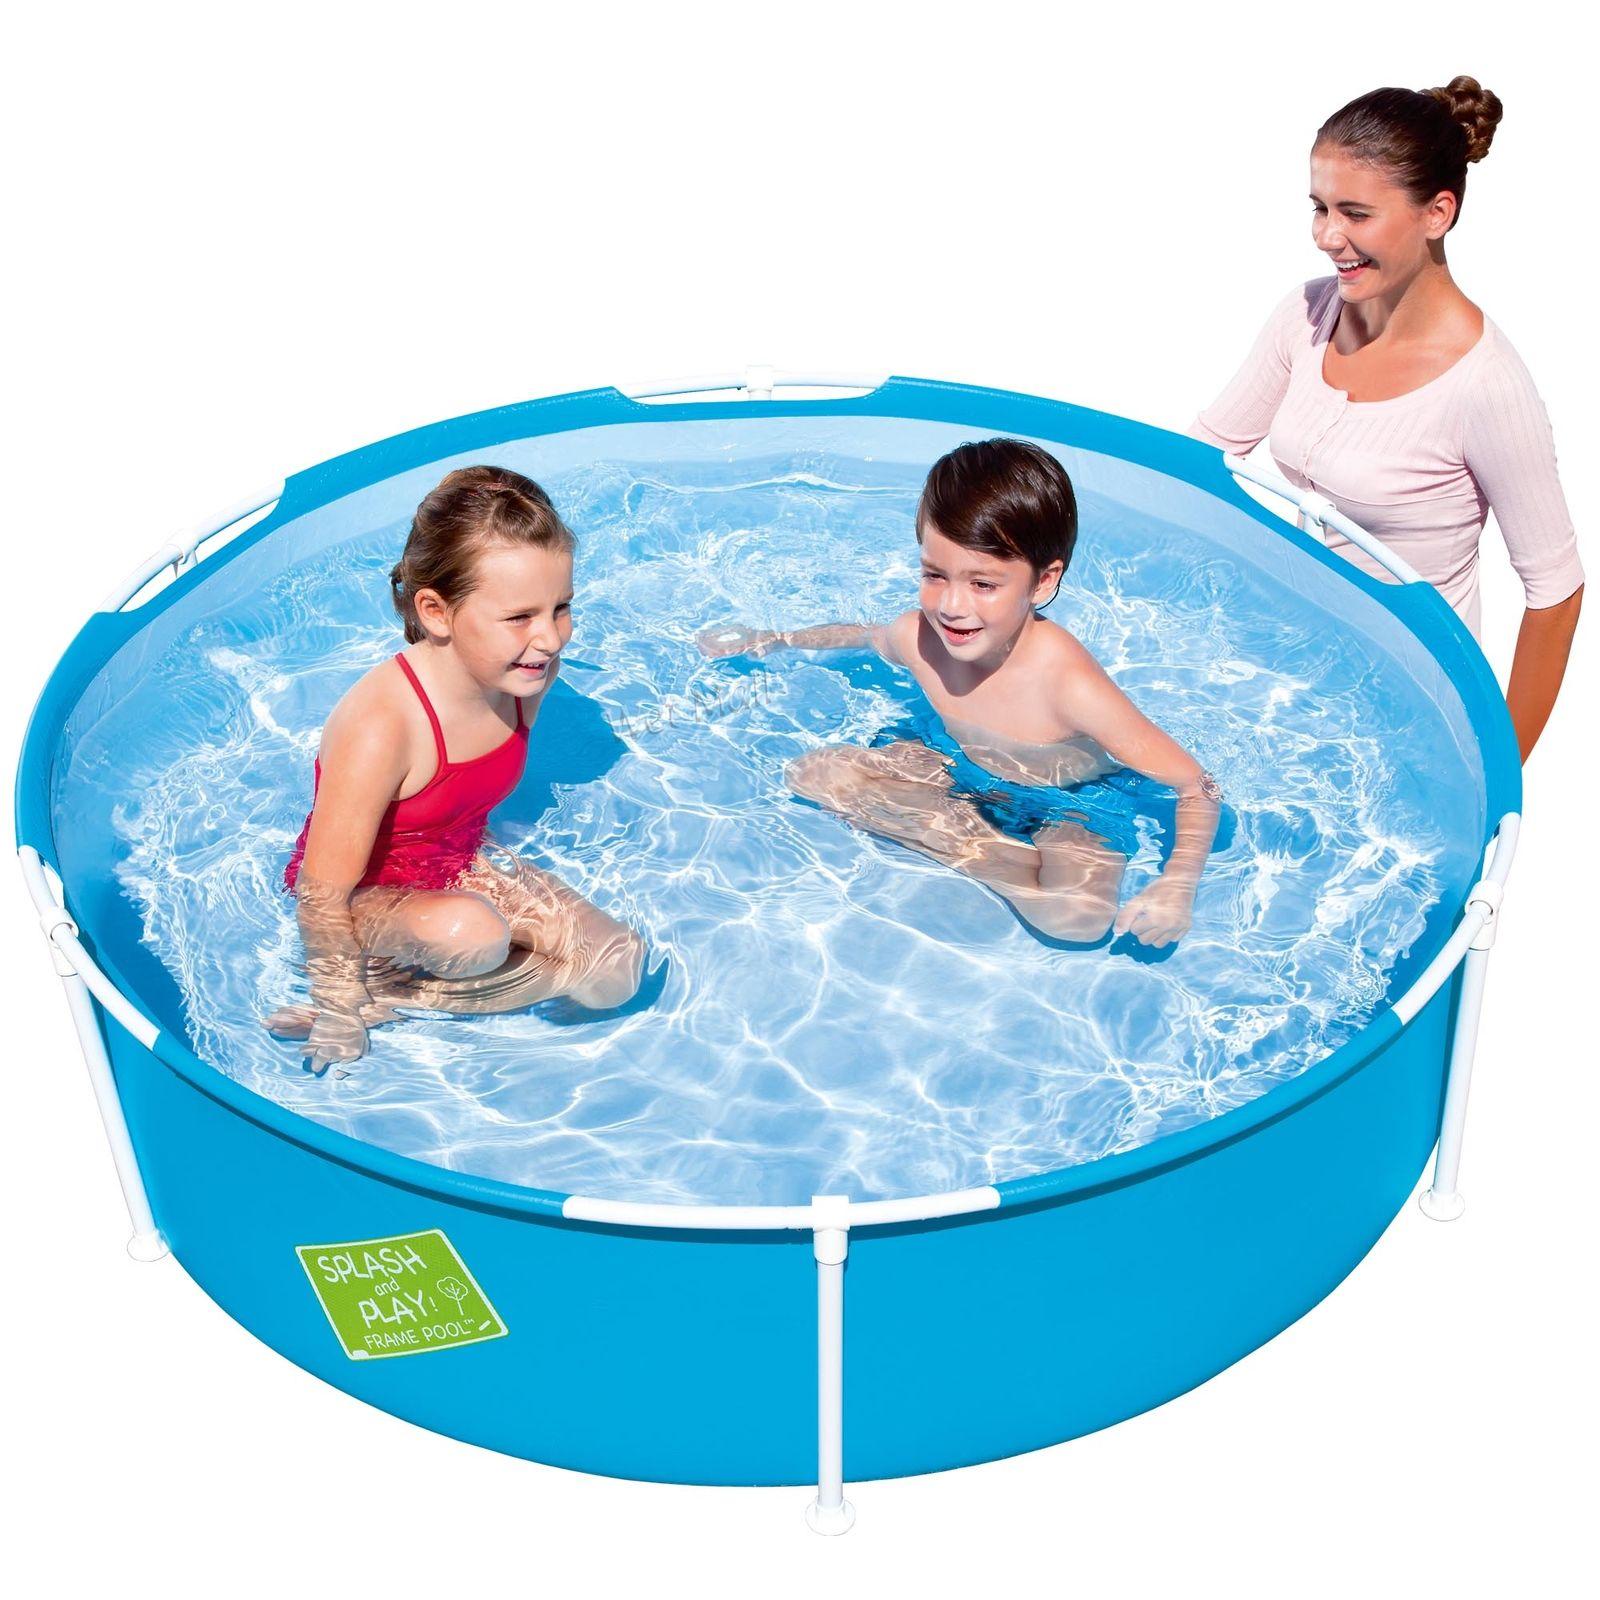 My First Frame Pool 60x15 Mini Round Kids Wading Kiddie Swimming Blue